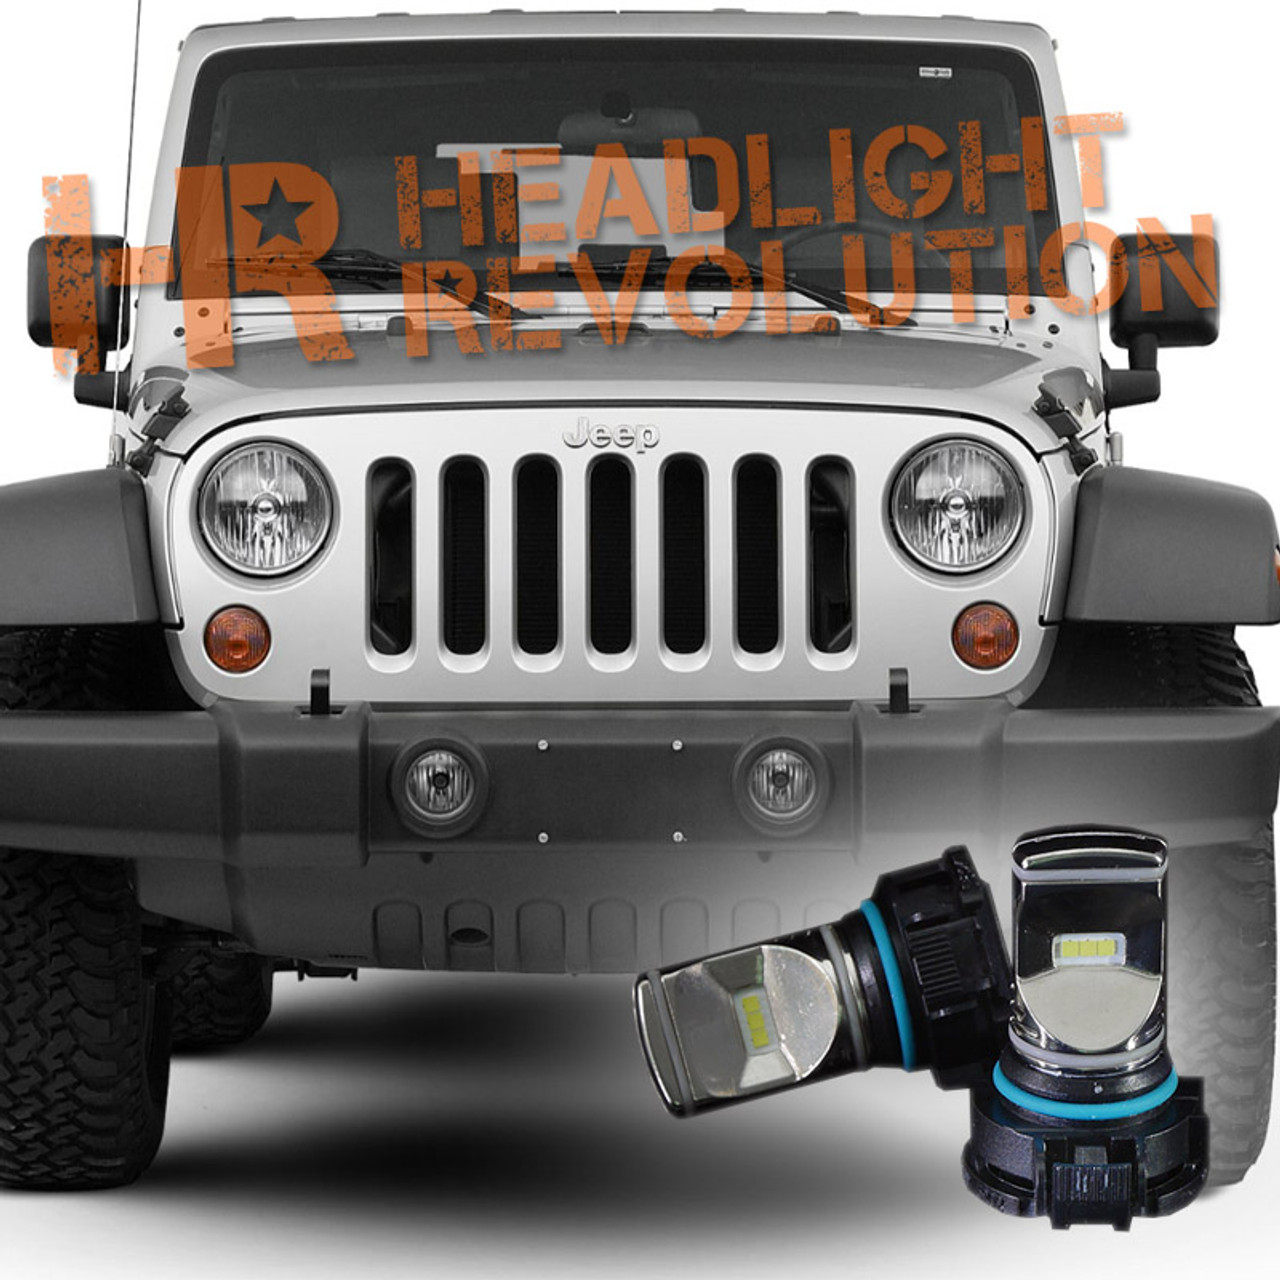 wiring diagram also evo jeep jk front bumper lights on jeep jk fog diagram also evo jeep jk front bumper lights on jeep jk fog light [ 1280 x 1280 Pixel ]